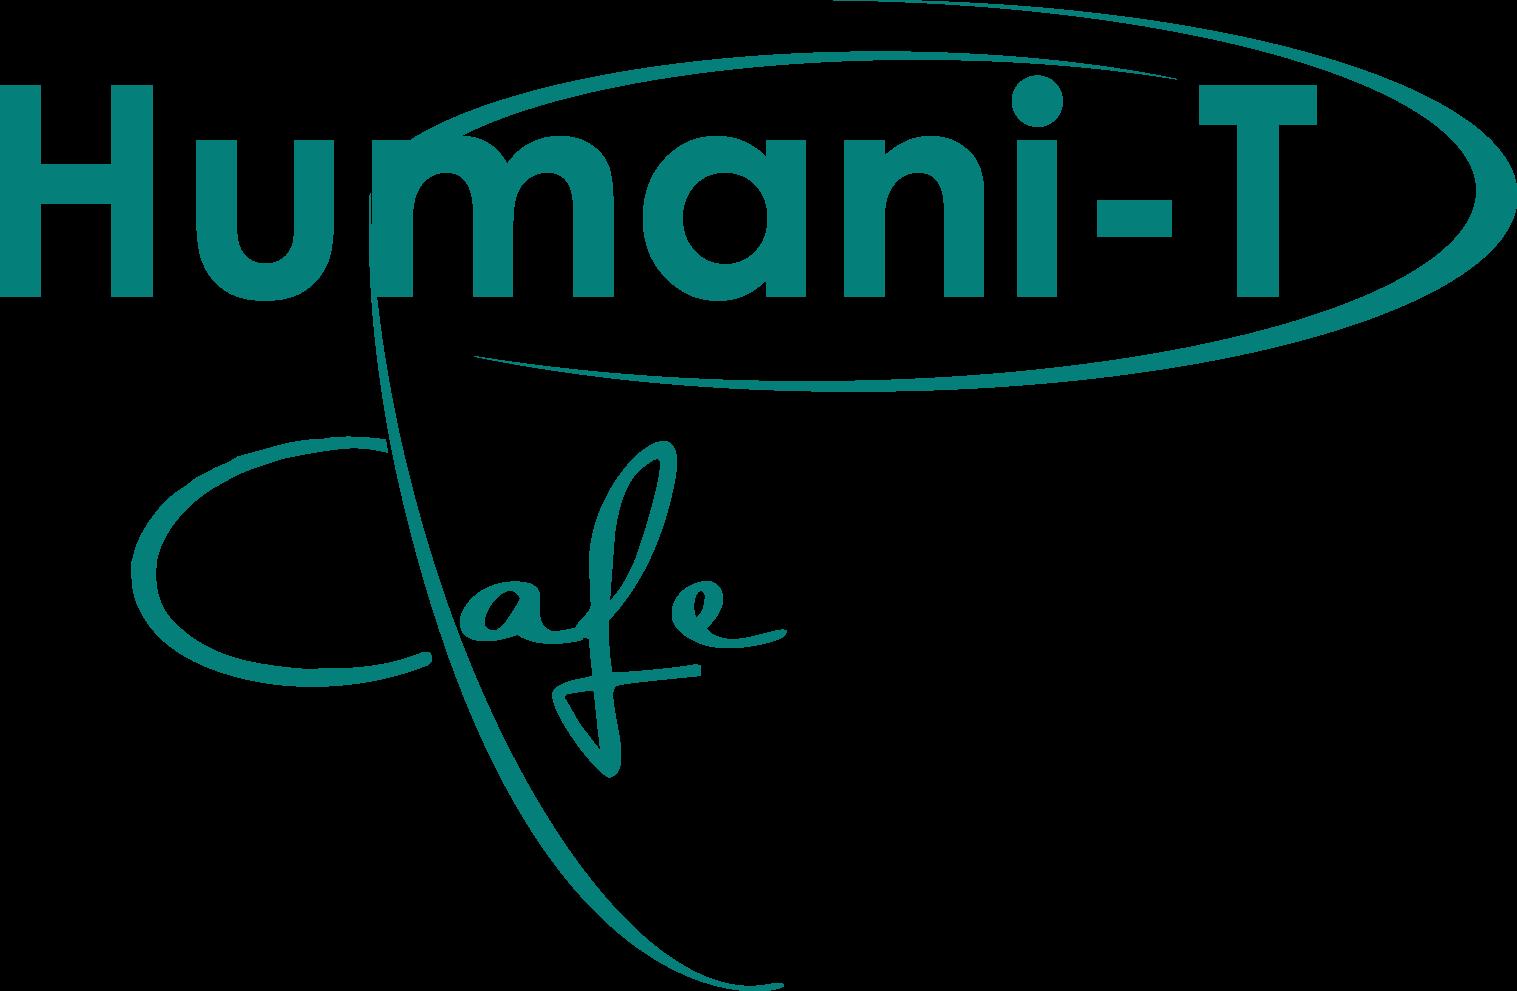 Humani-T Cafe